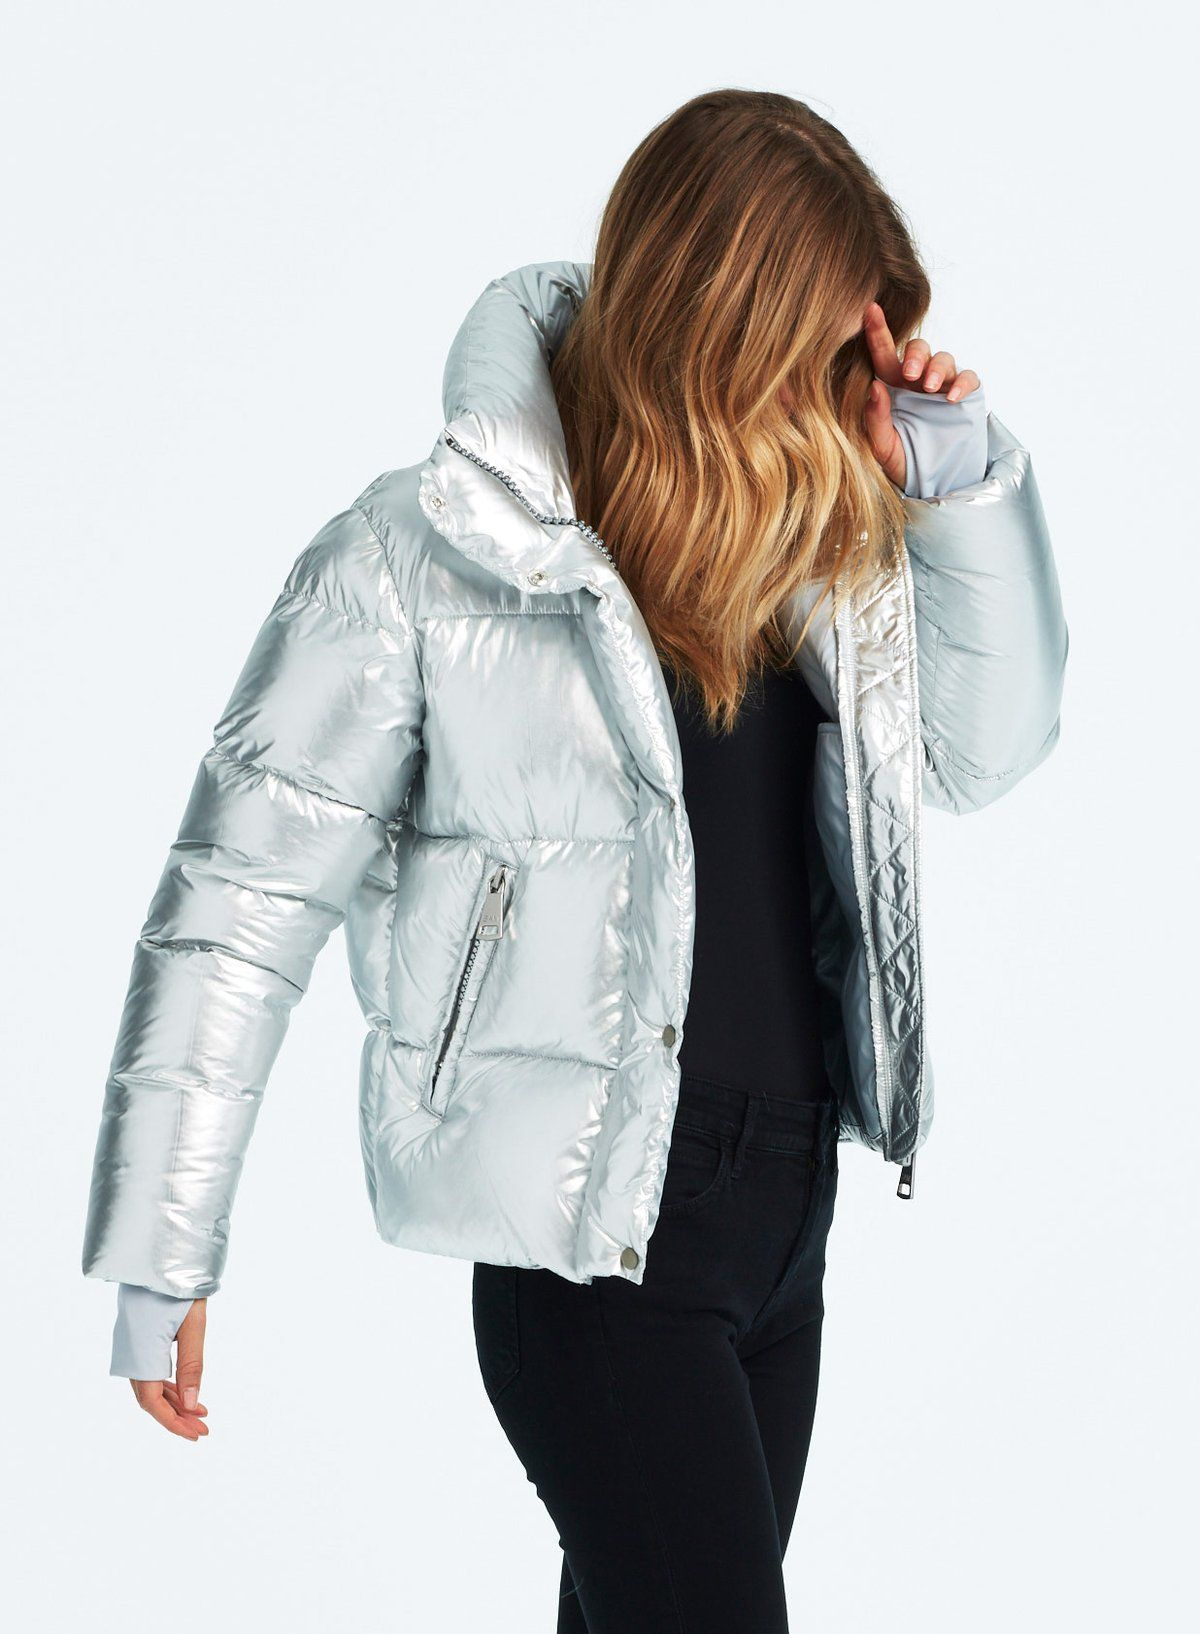 Andi Silver Ice Jackets Puffer Jacket Women Ski Jacket Women [ 1634 x 1200 Pixel ]